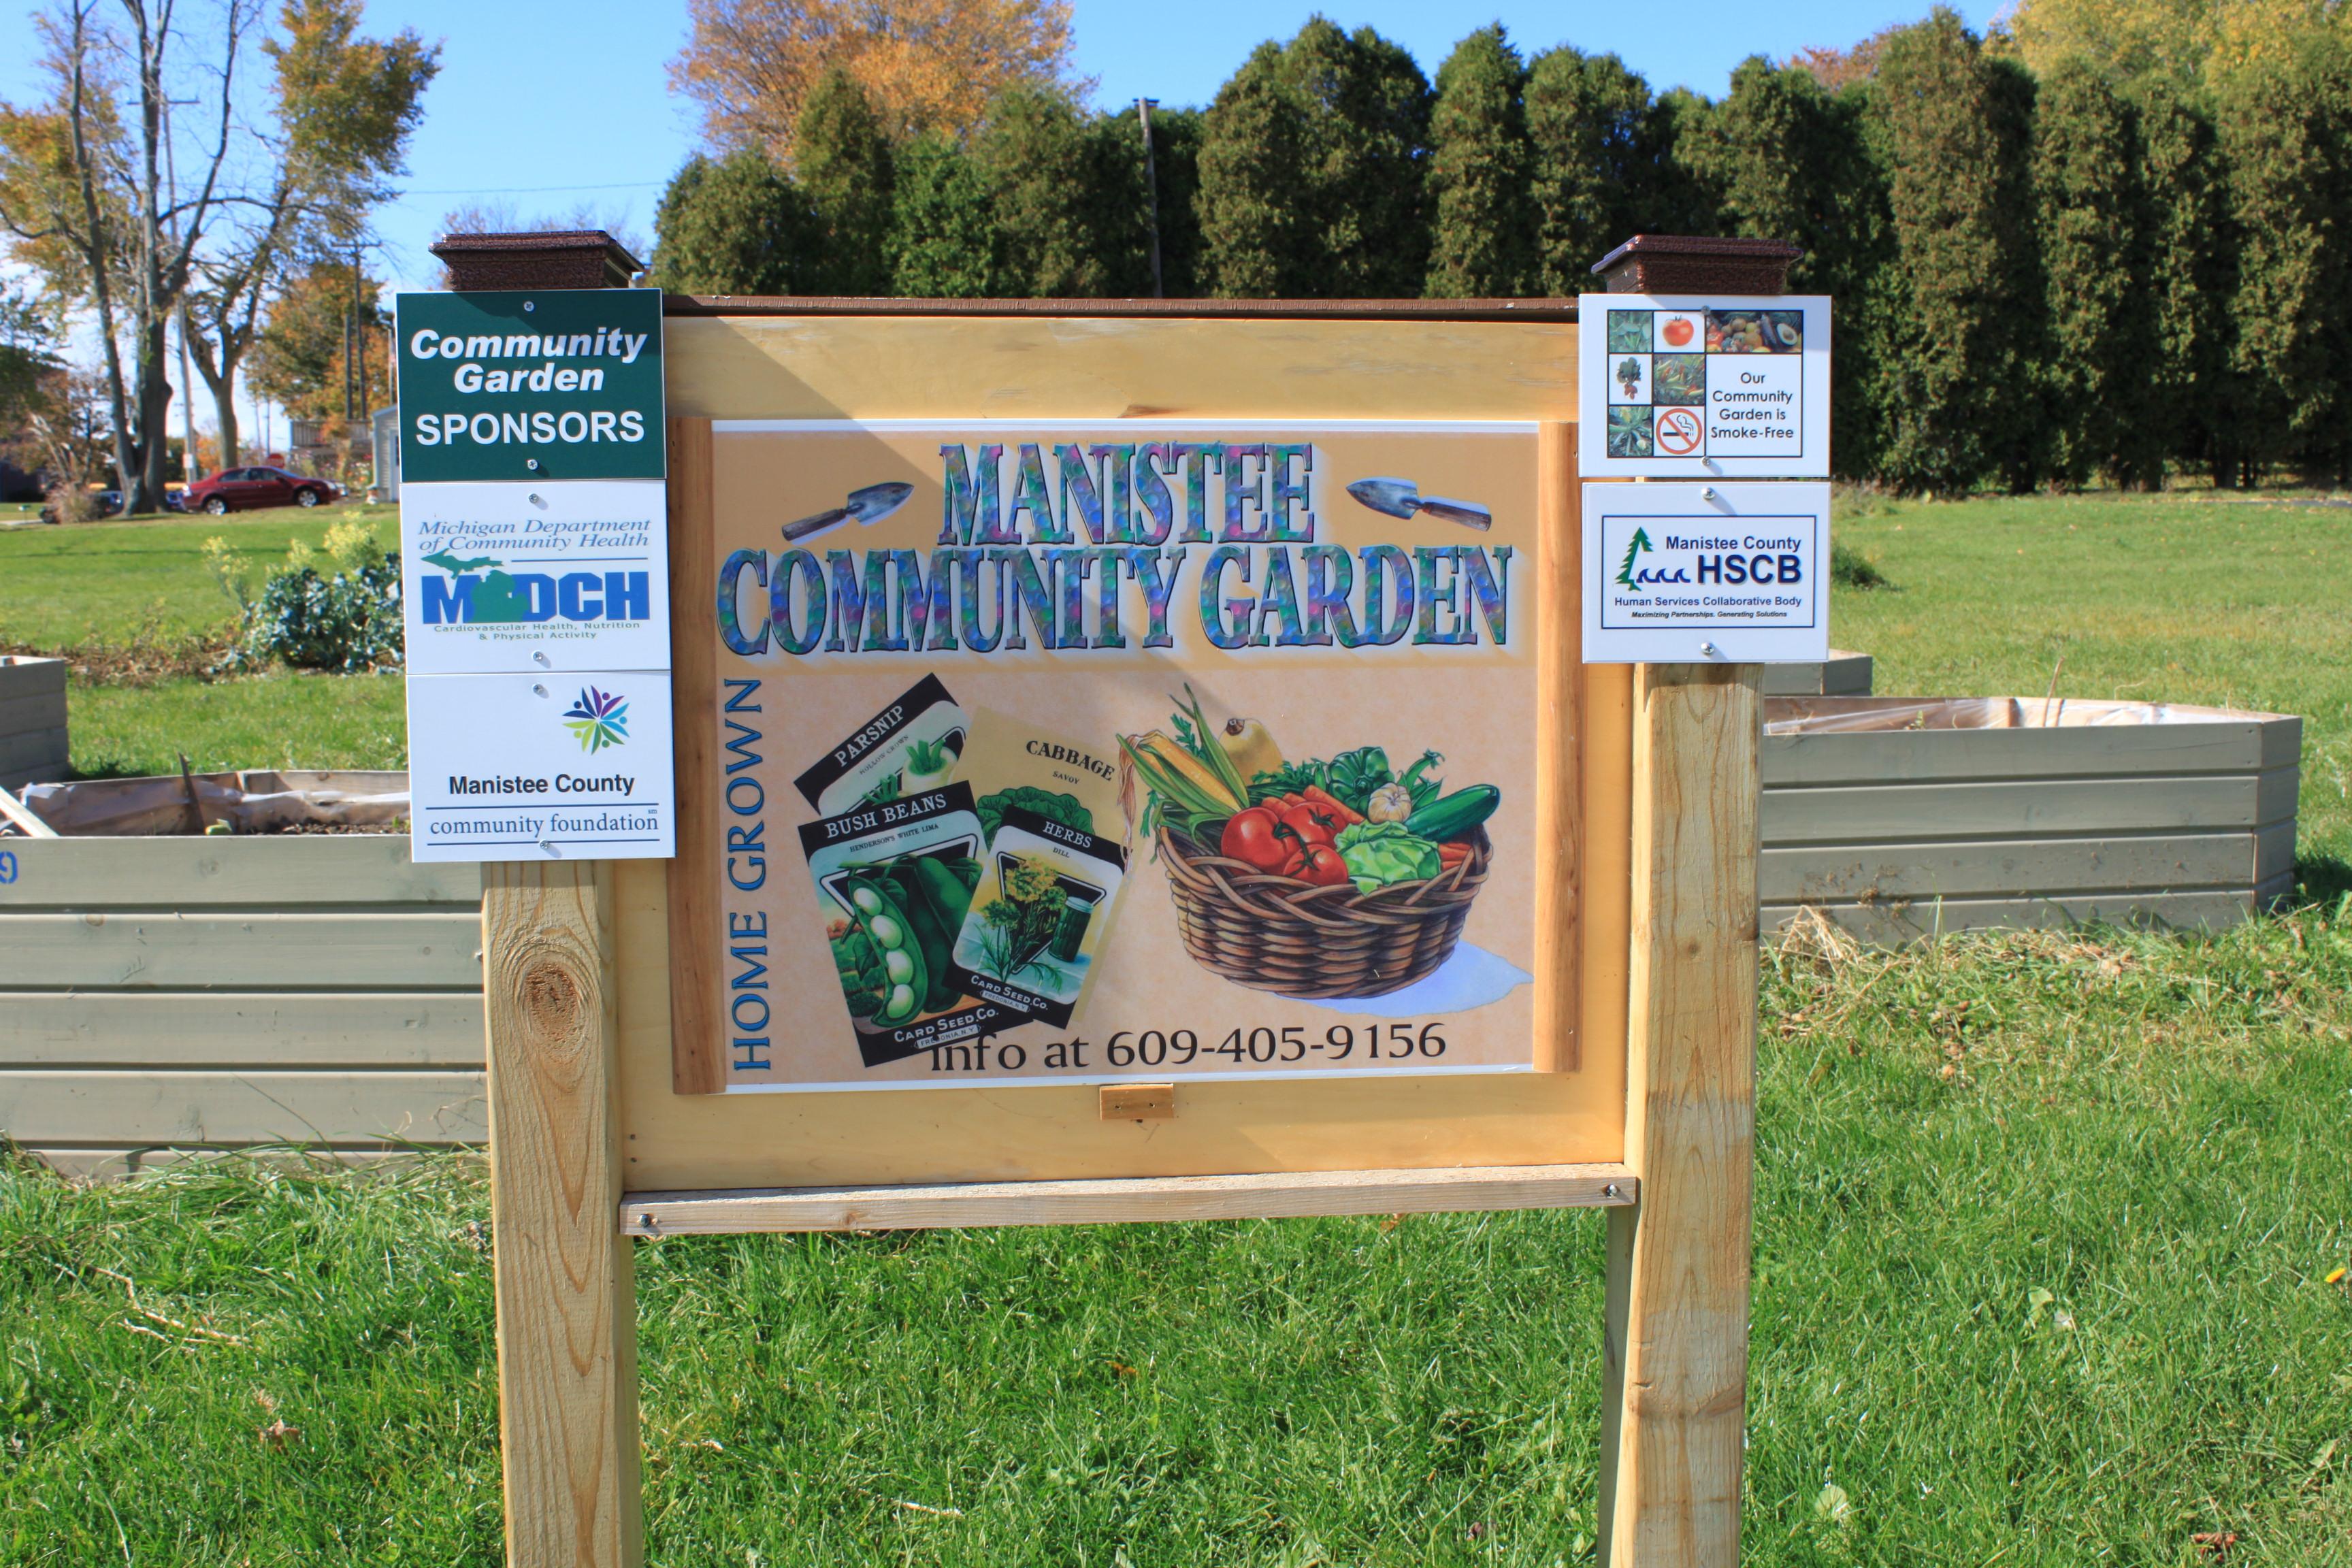 Community Gardens Manistee Community Kitchen